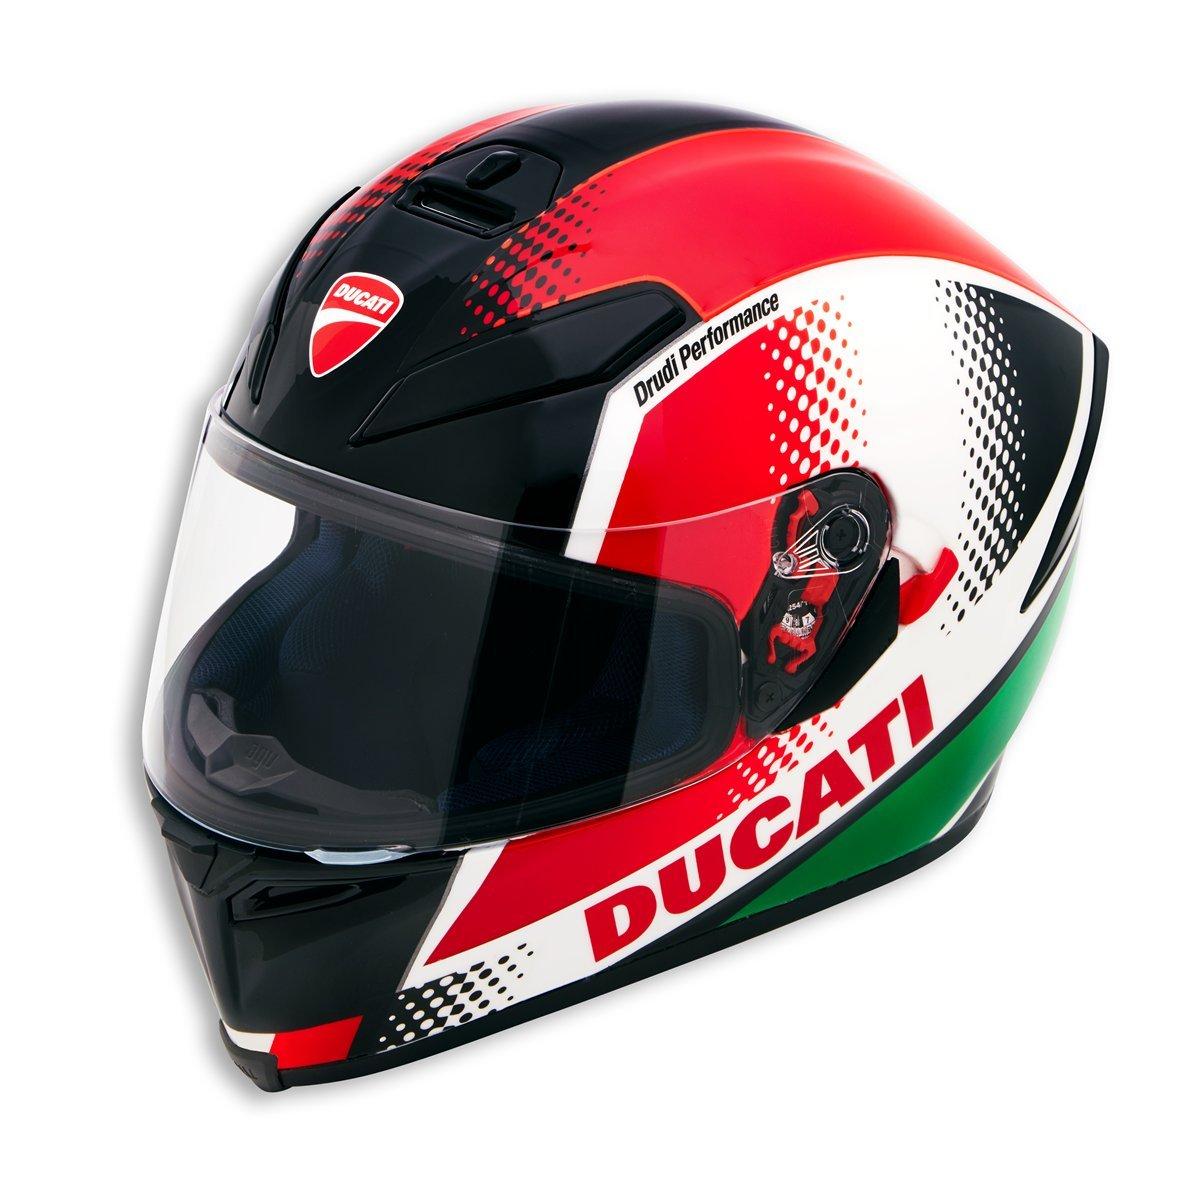 Amazon.com: Ducati Peak V3 Full face helmet by AGV 98103701 (M): Automotive